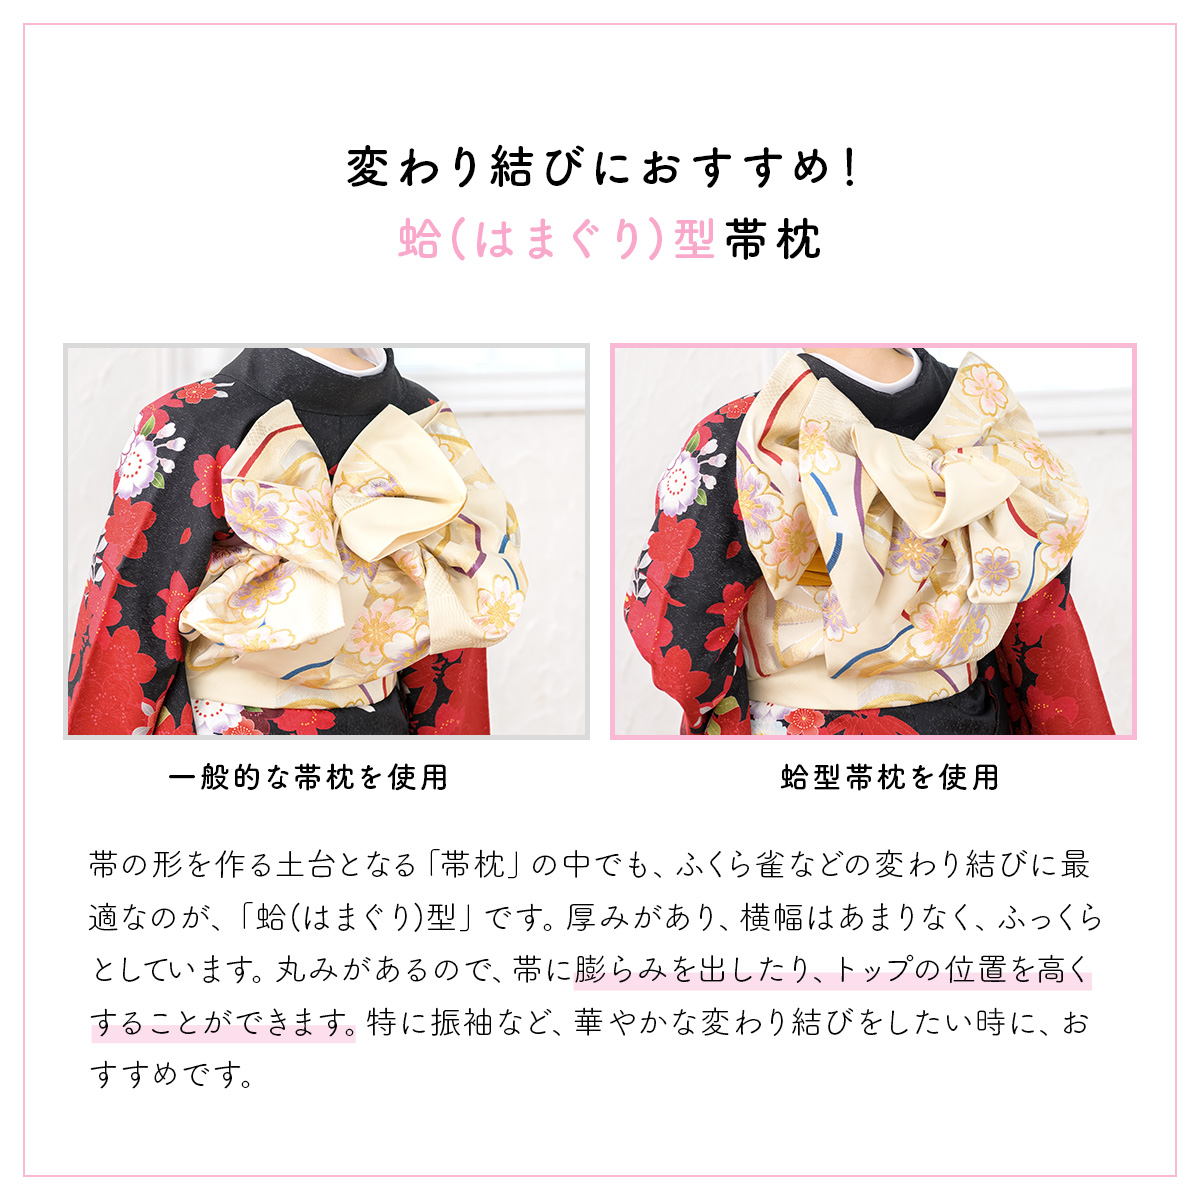 Polyurethane belt pillow with gauze quinceañera furisode kimono clam shell type kimono accessories dressing accessories furisode